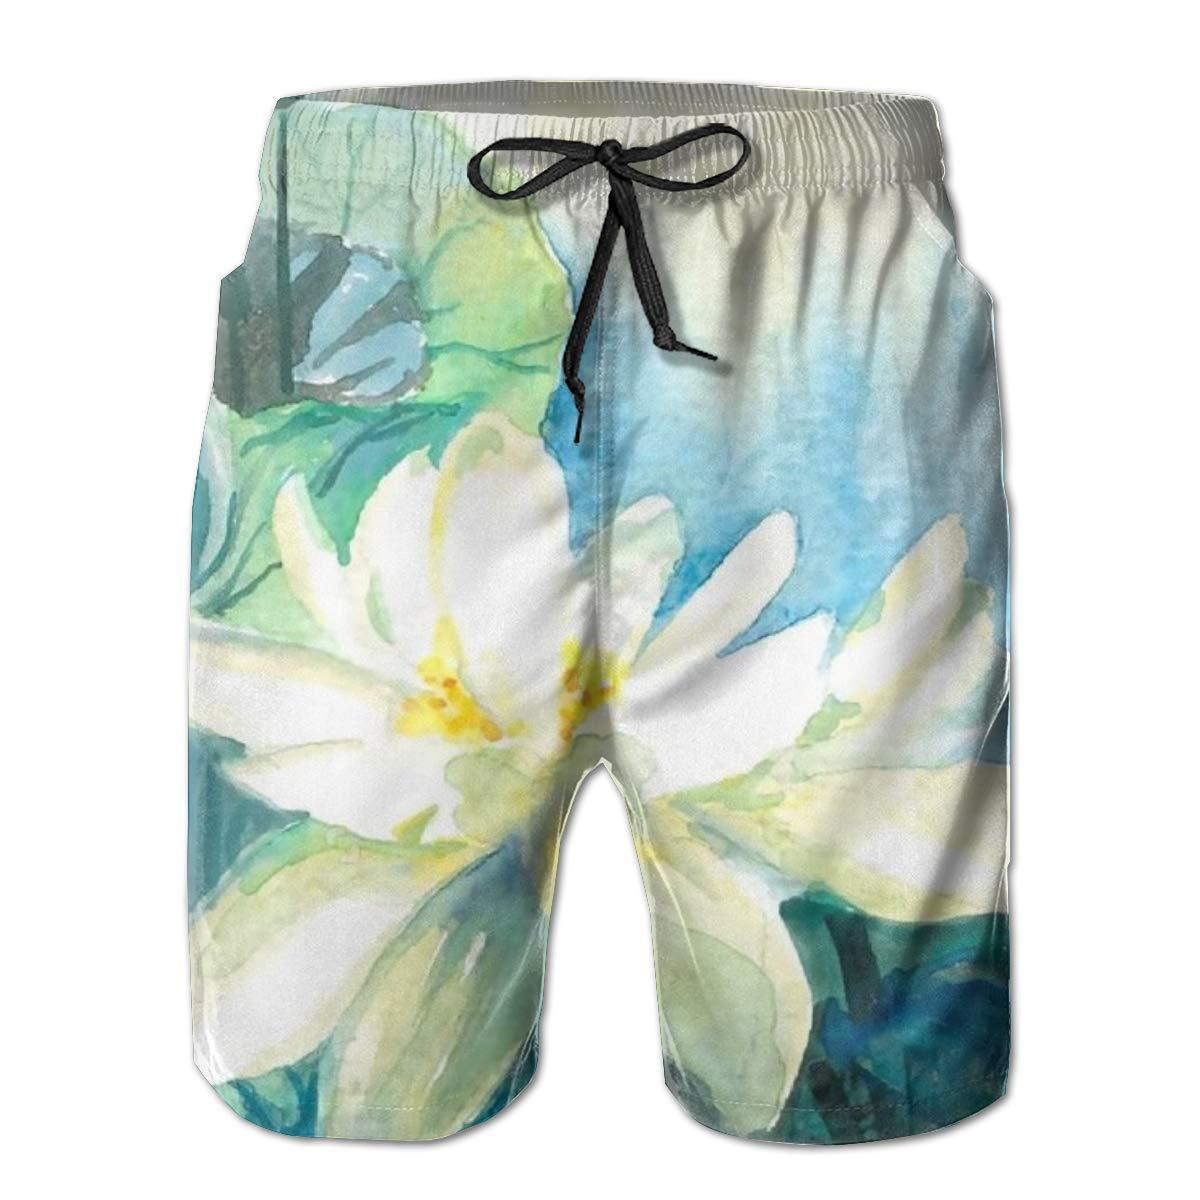 Airealy Men/'s Summer Beach Trunks White Lotus Flower Drawstring Elastic Waist Quick Dry Swim Shorts Swimwear